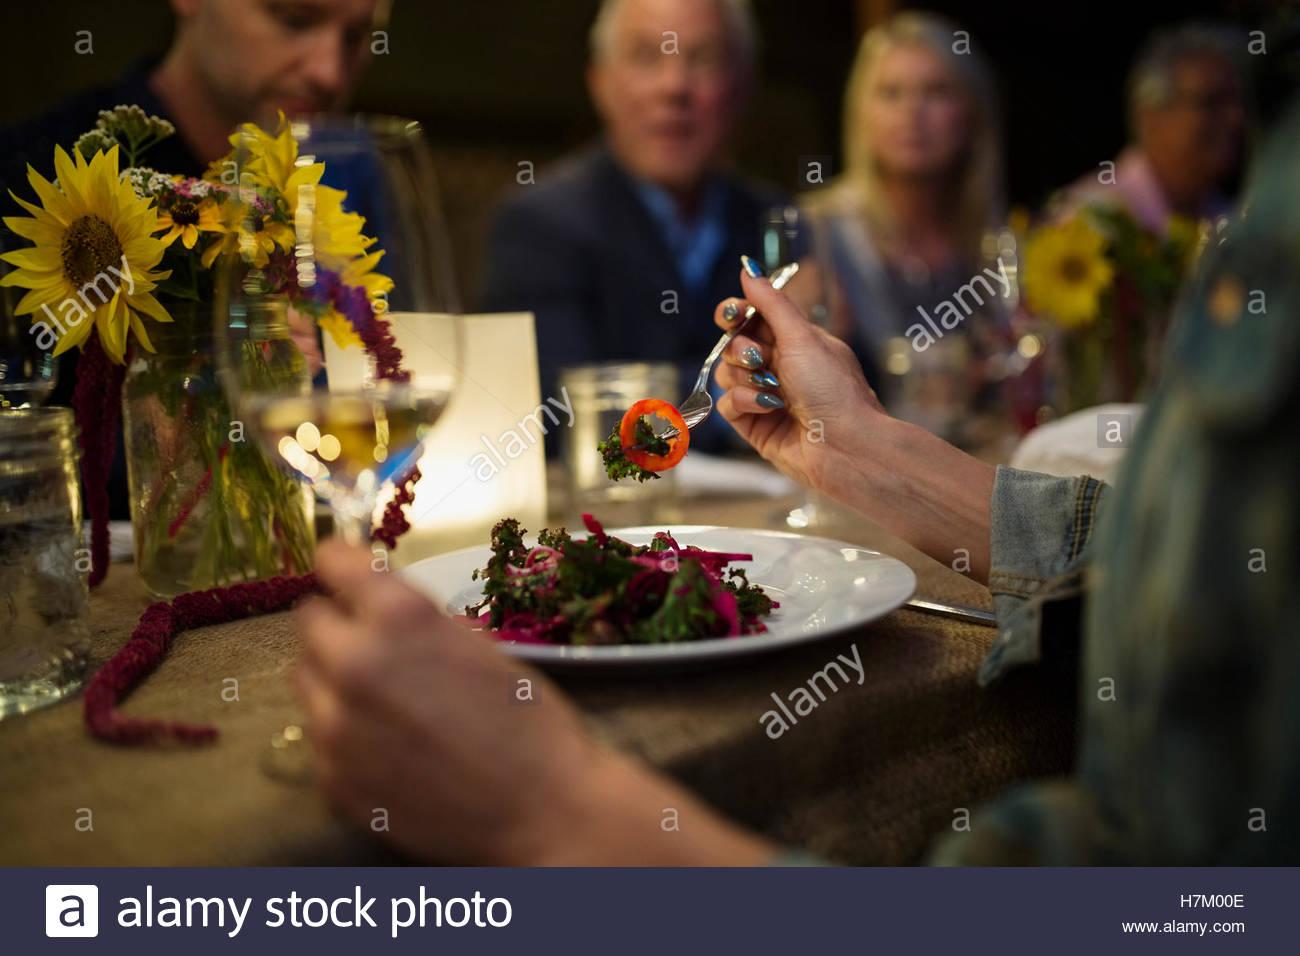 Frau, Essen bei Kerzenlicht-Outdoor-Dinner-party Stockbild